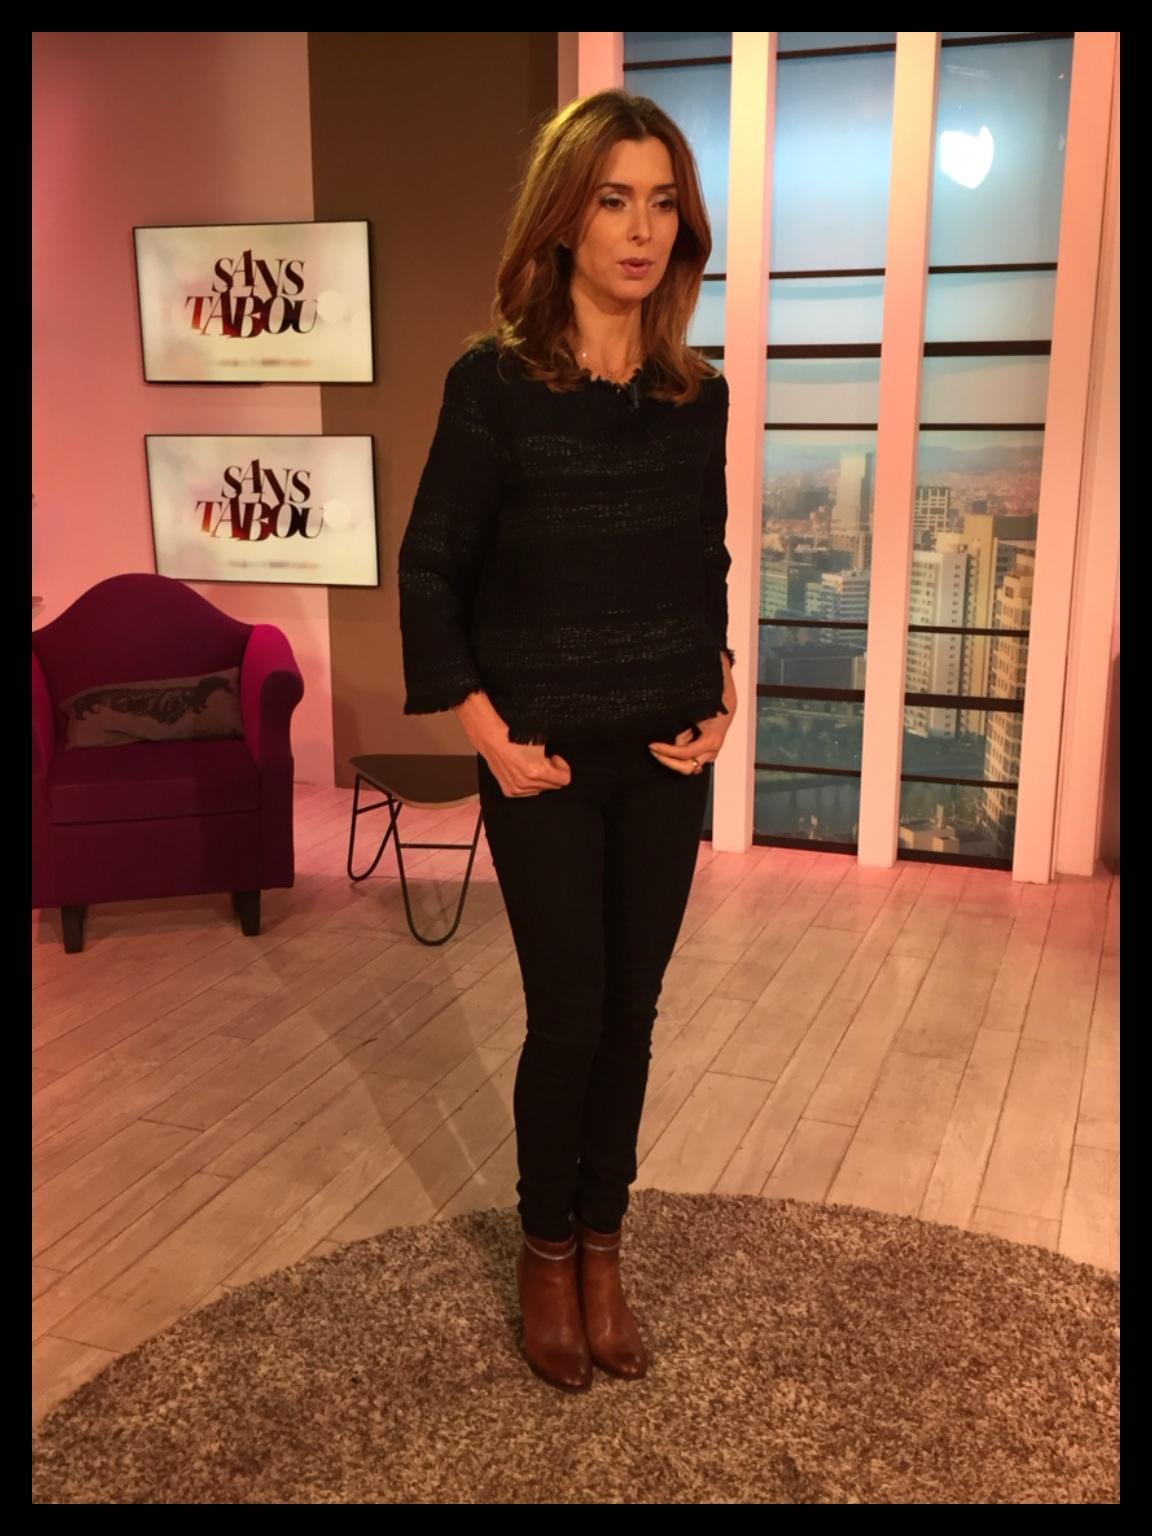 Byjohanna Fath Outfit Veronique Mounier